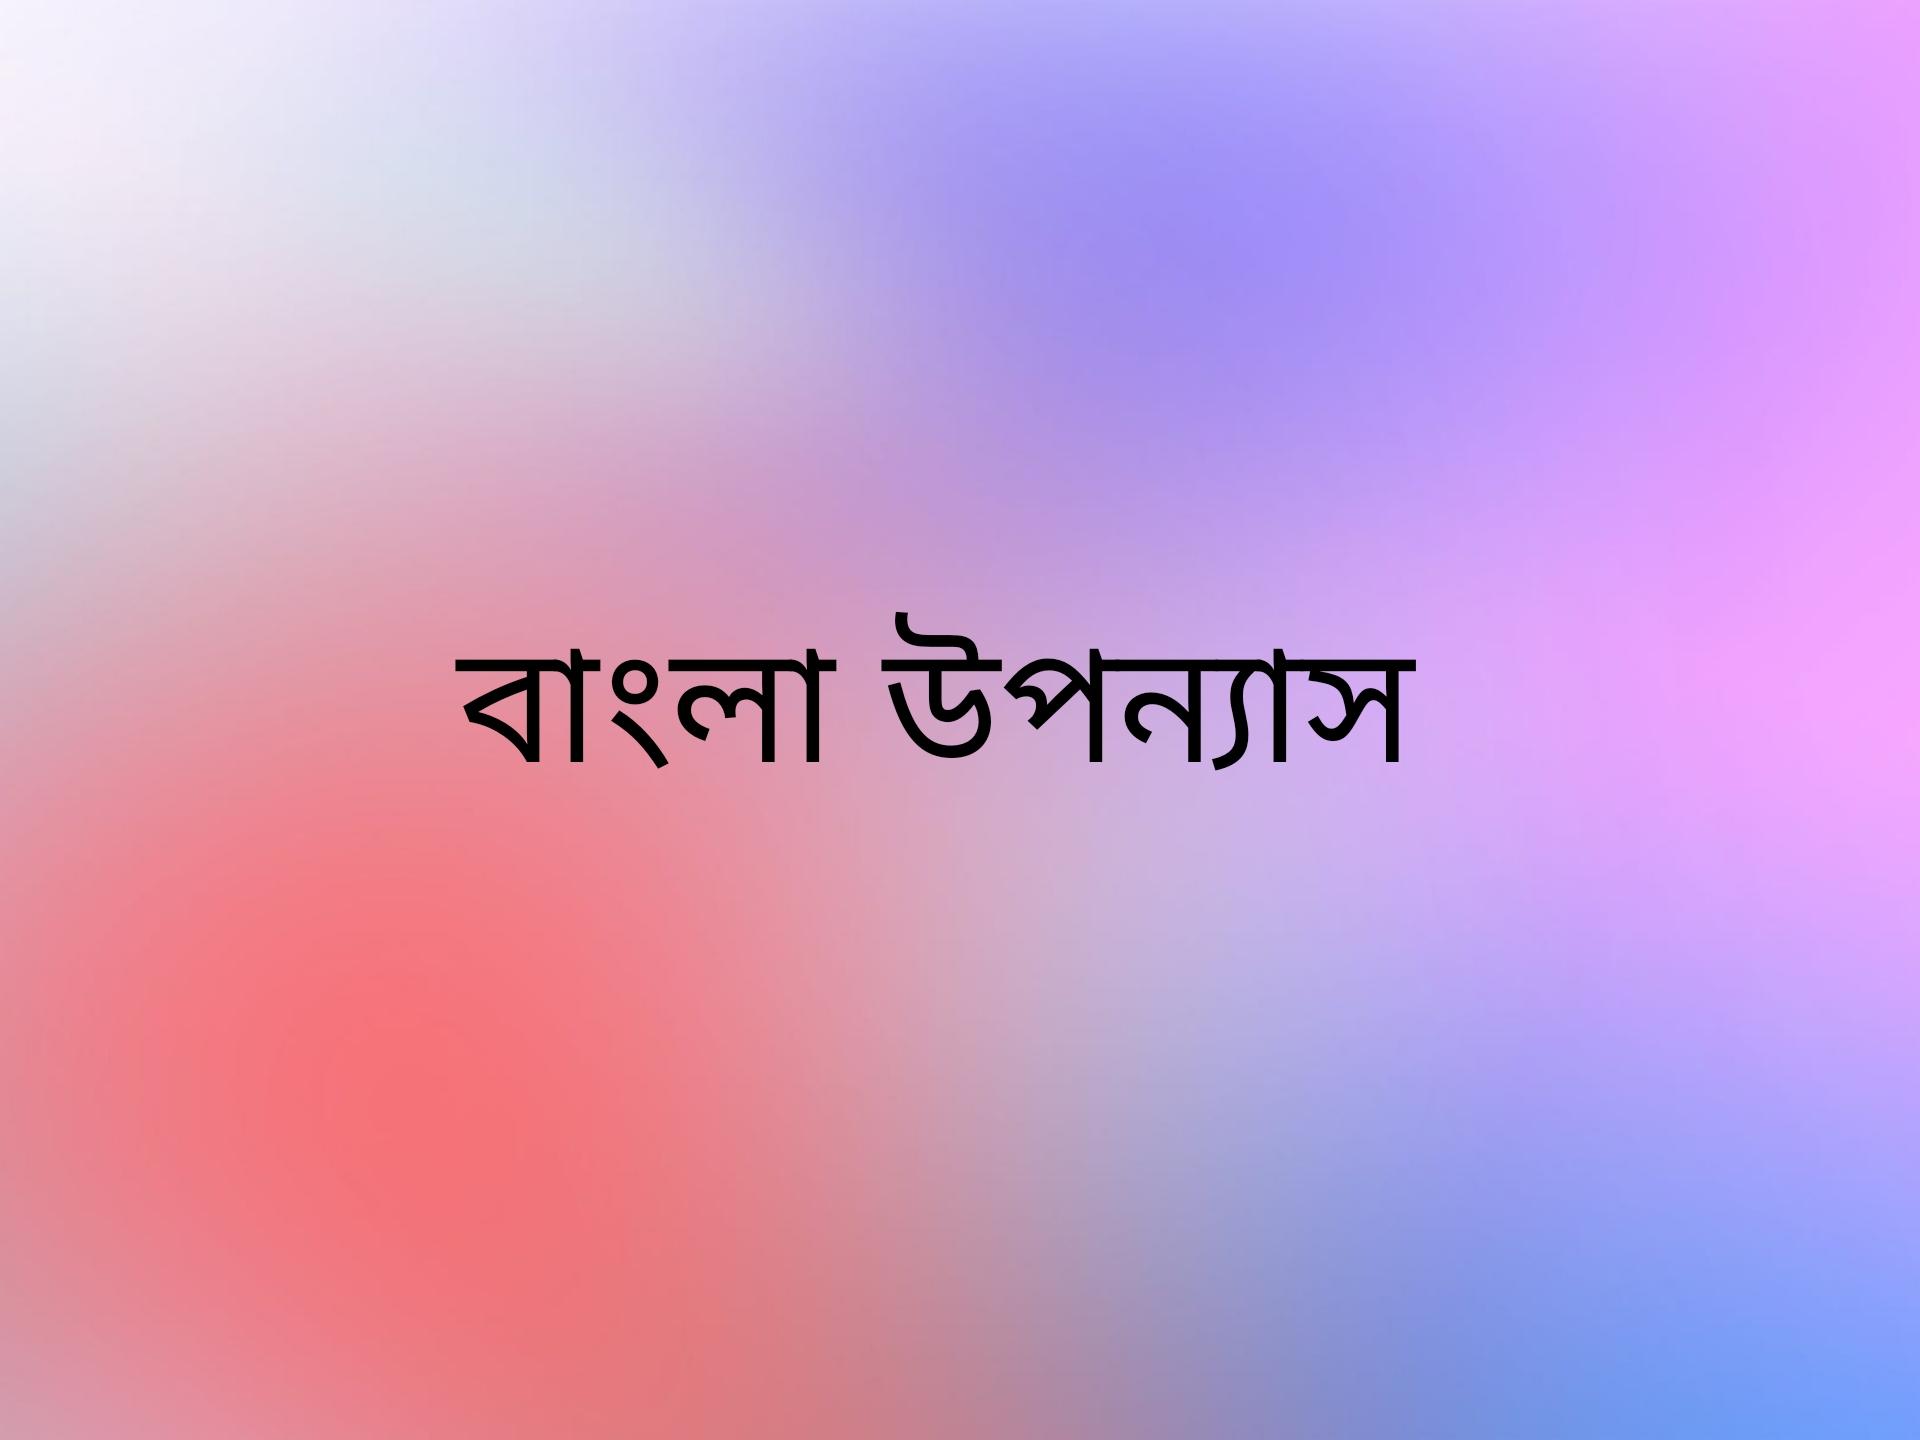 bangla uponnash pdf download link, bangla uponnash pdf book,  bangla uponnash pdf download,  bangla uponnash